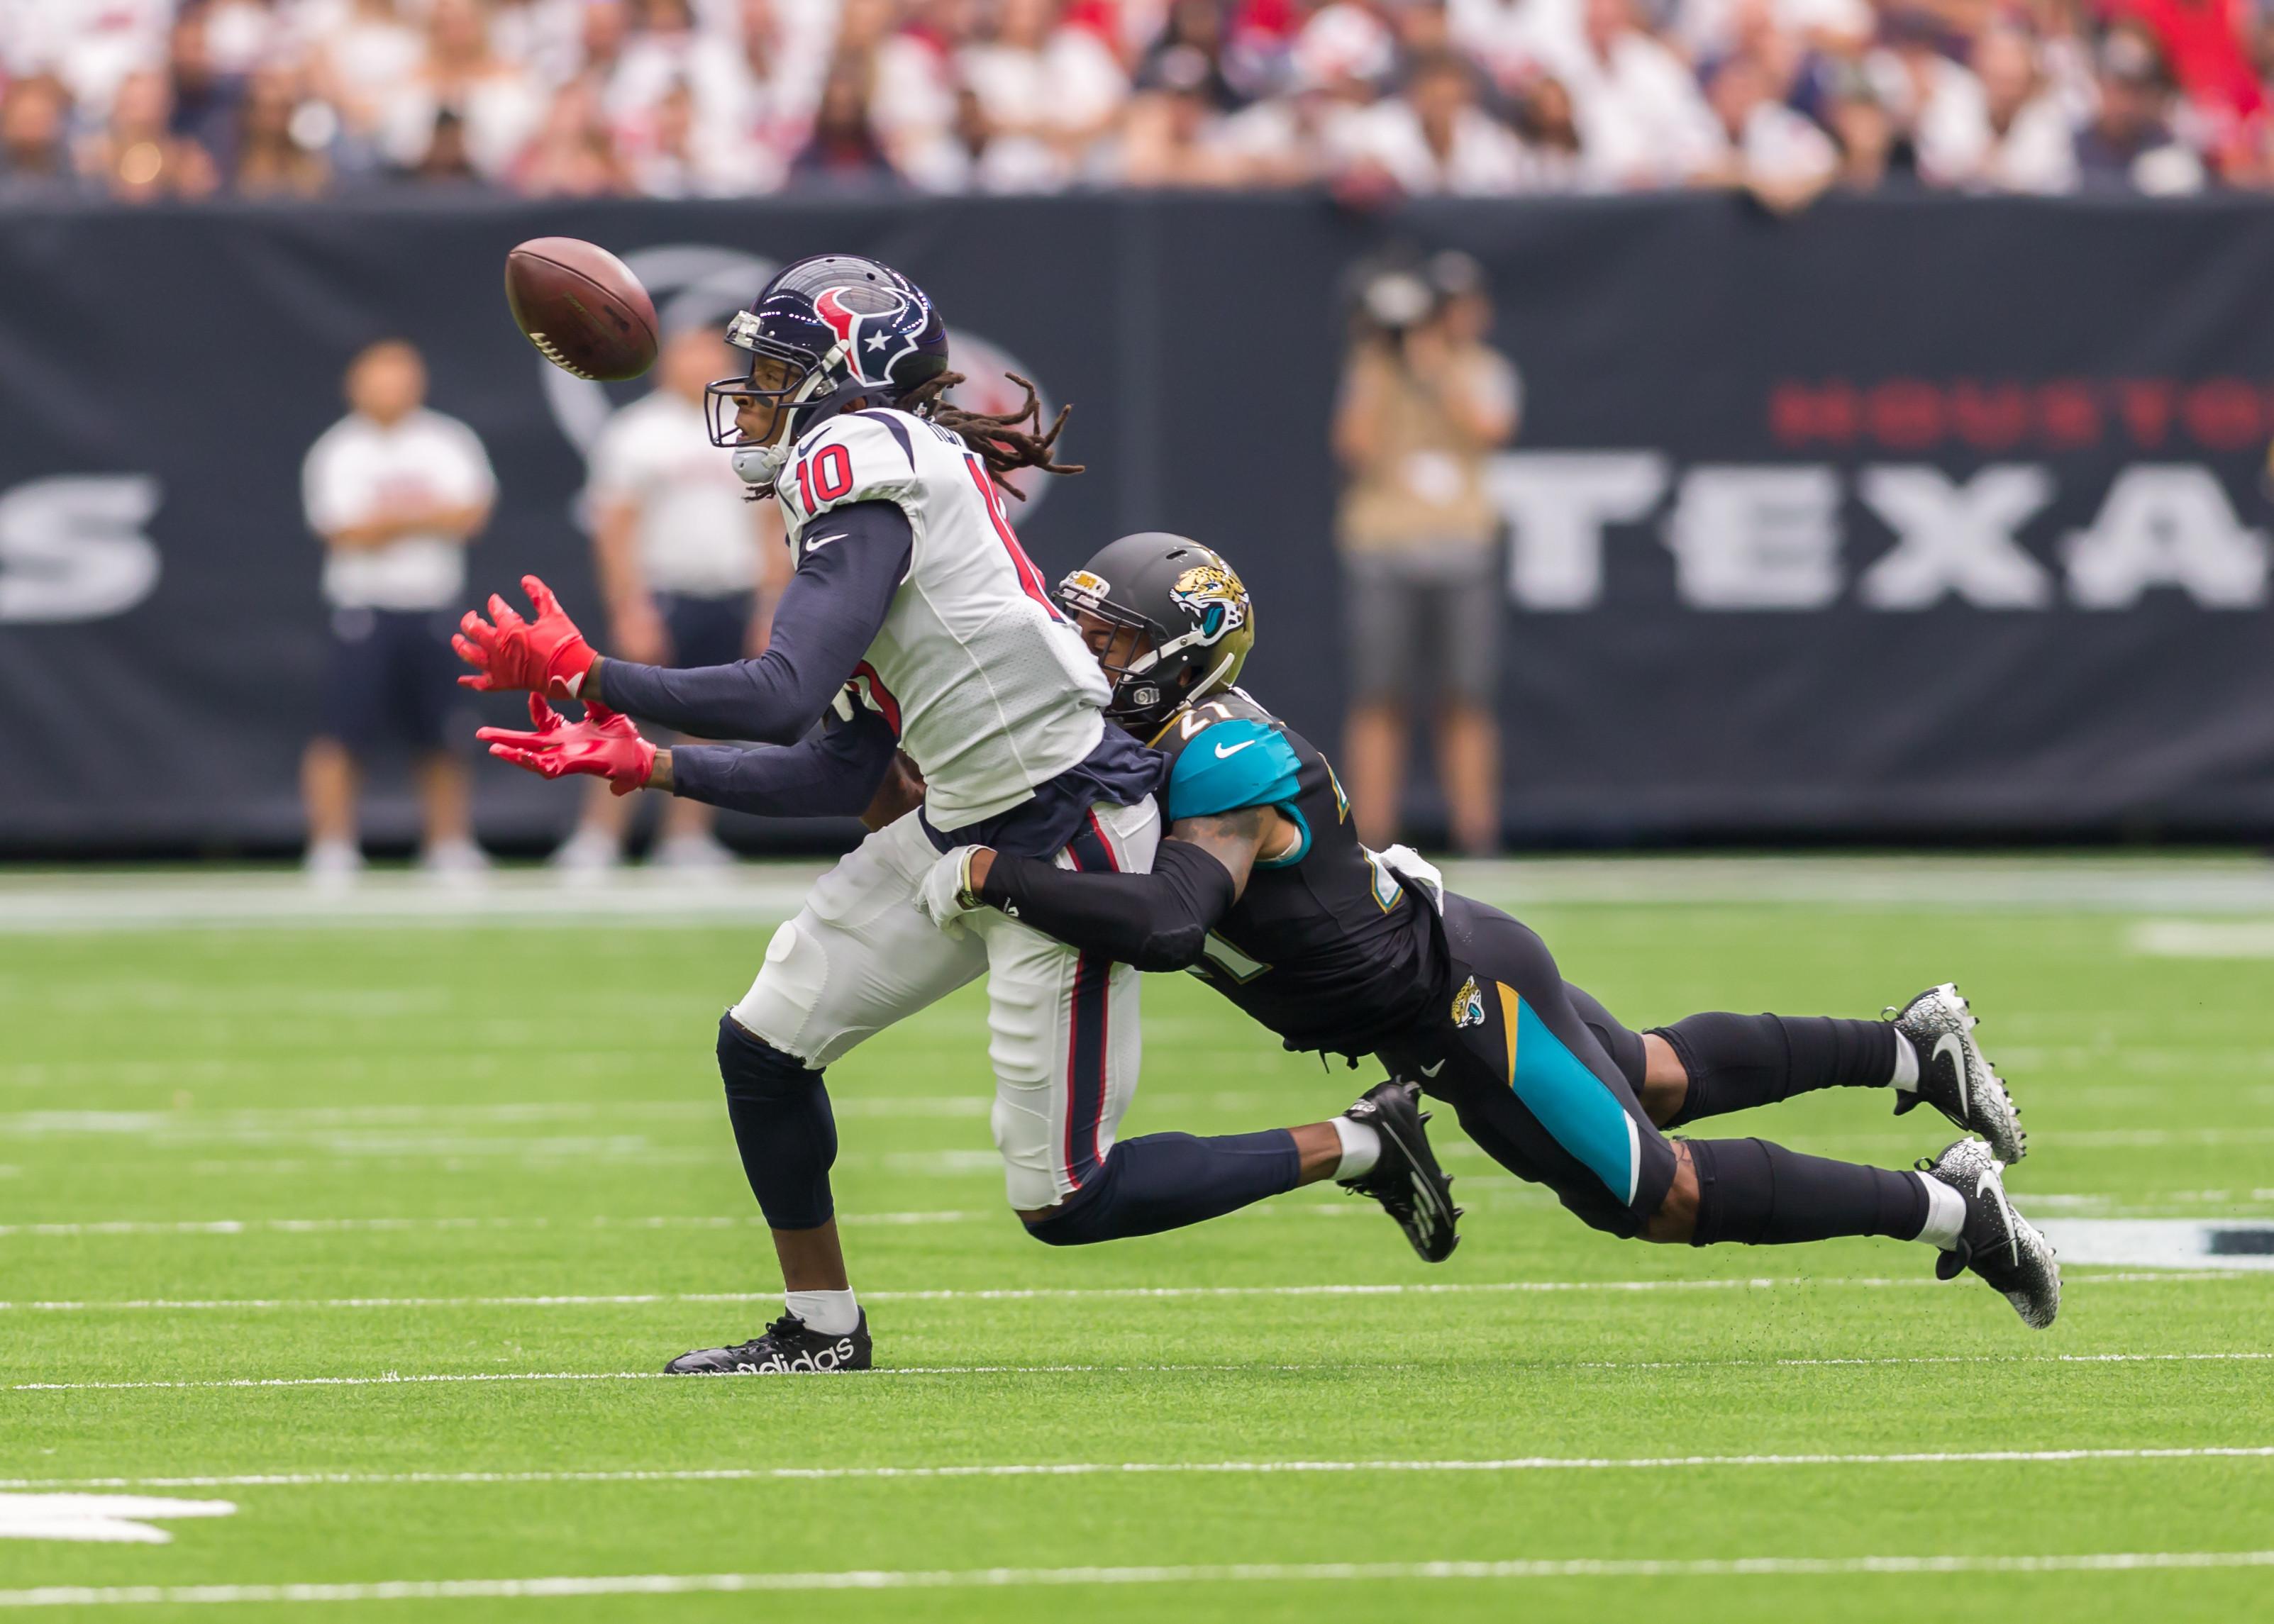 NFL: SEP 10 Jaguars at Texans